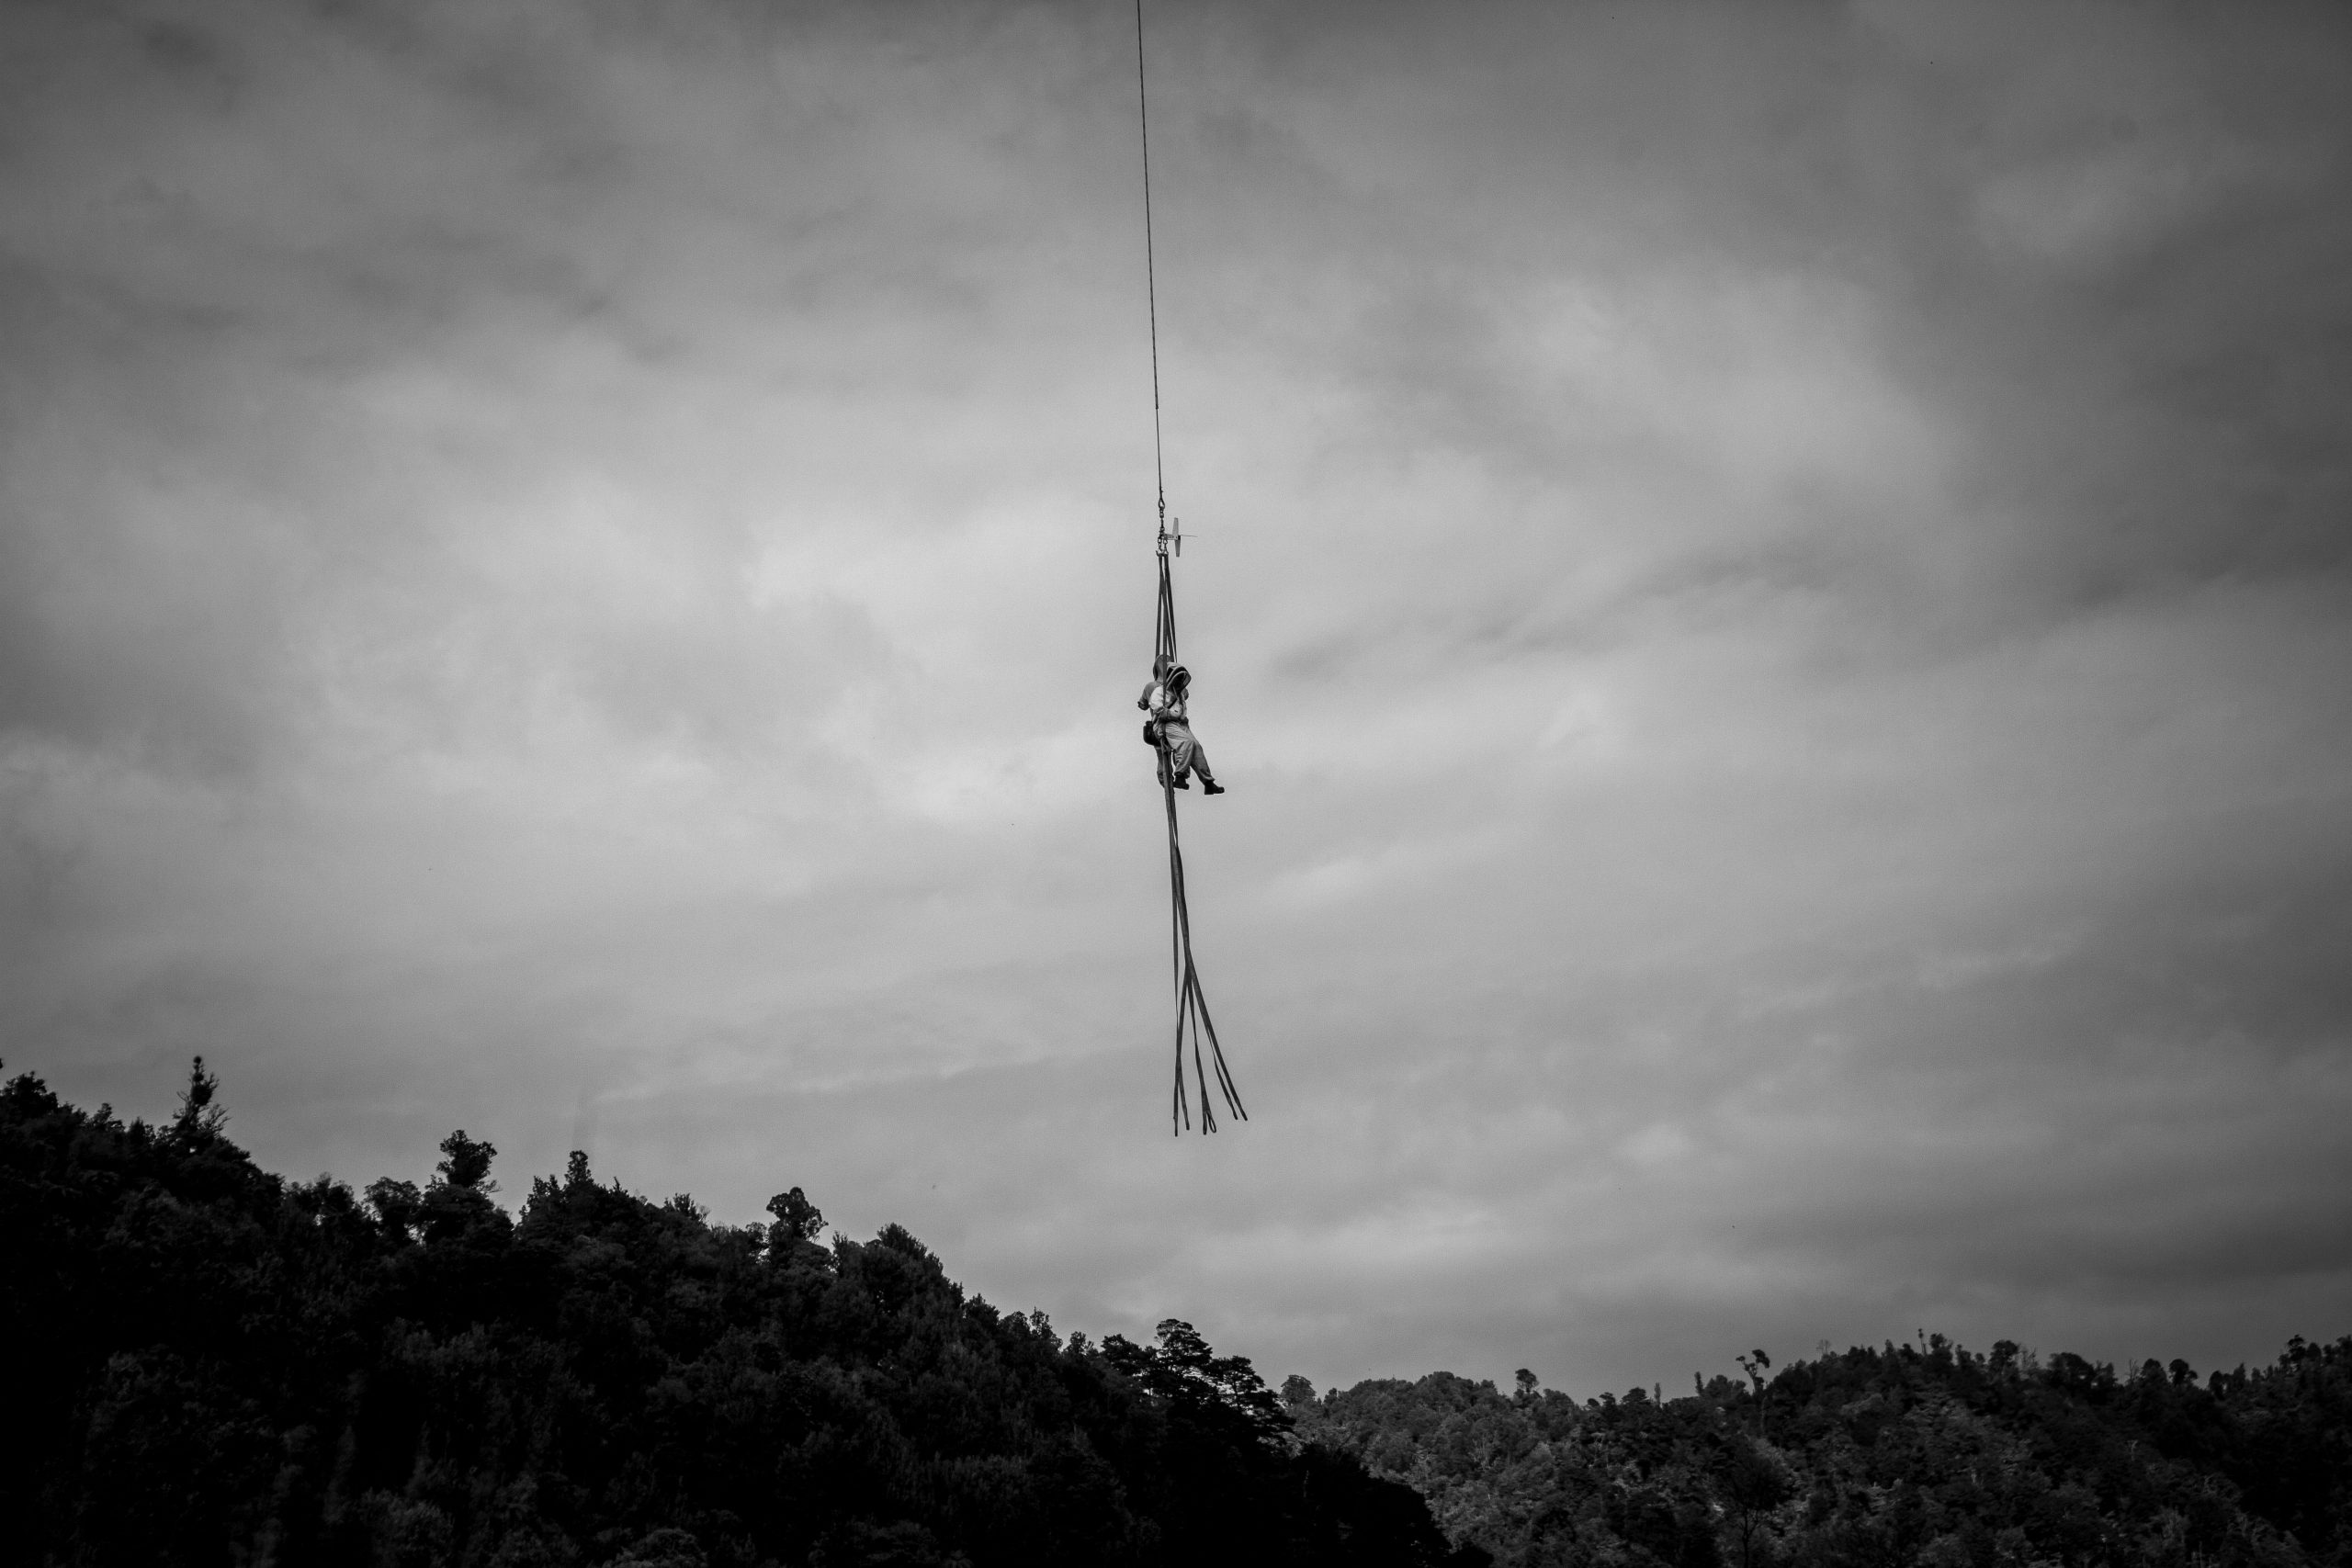 flying_saucer_photography_egmont_honey_MG_8548